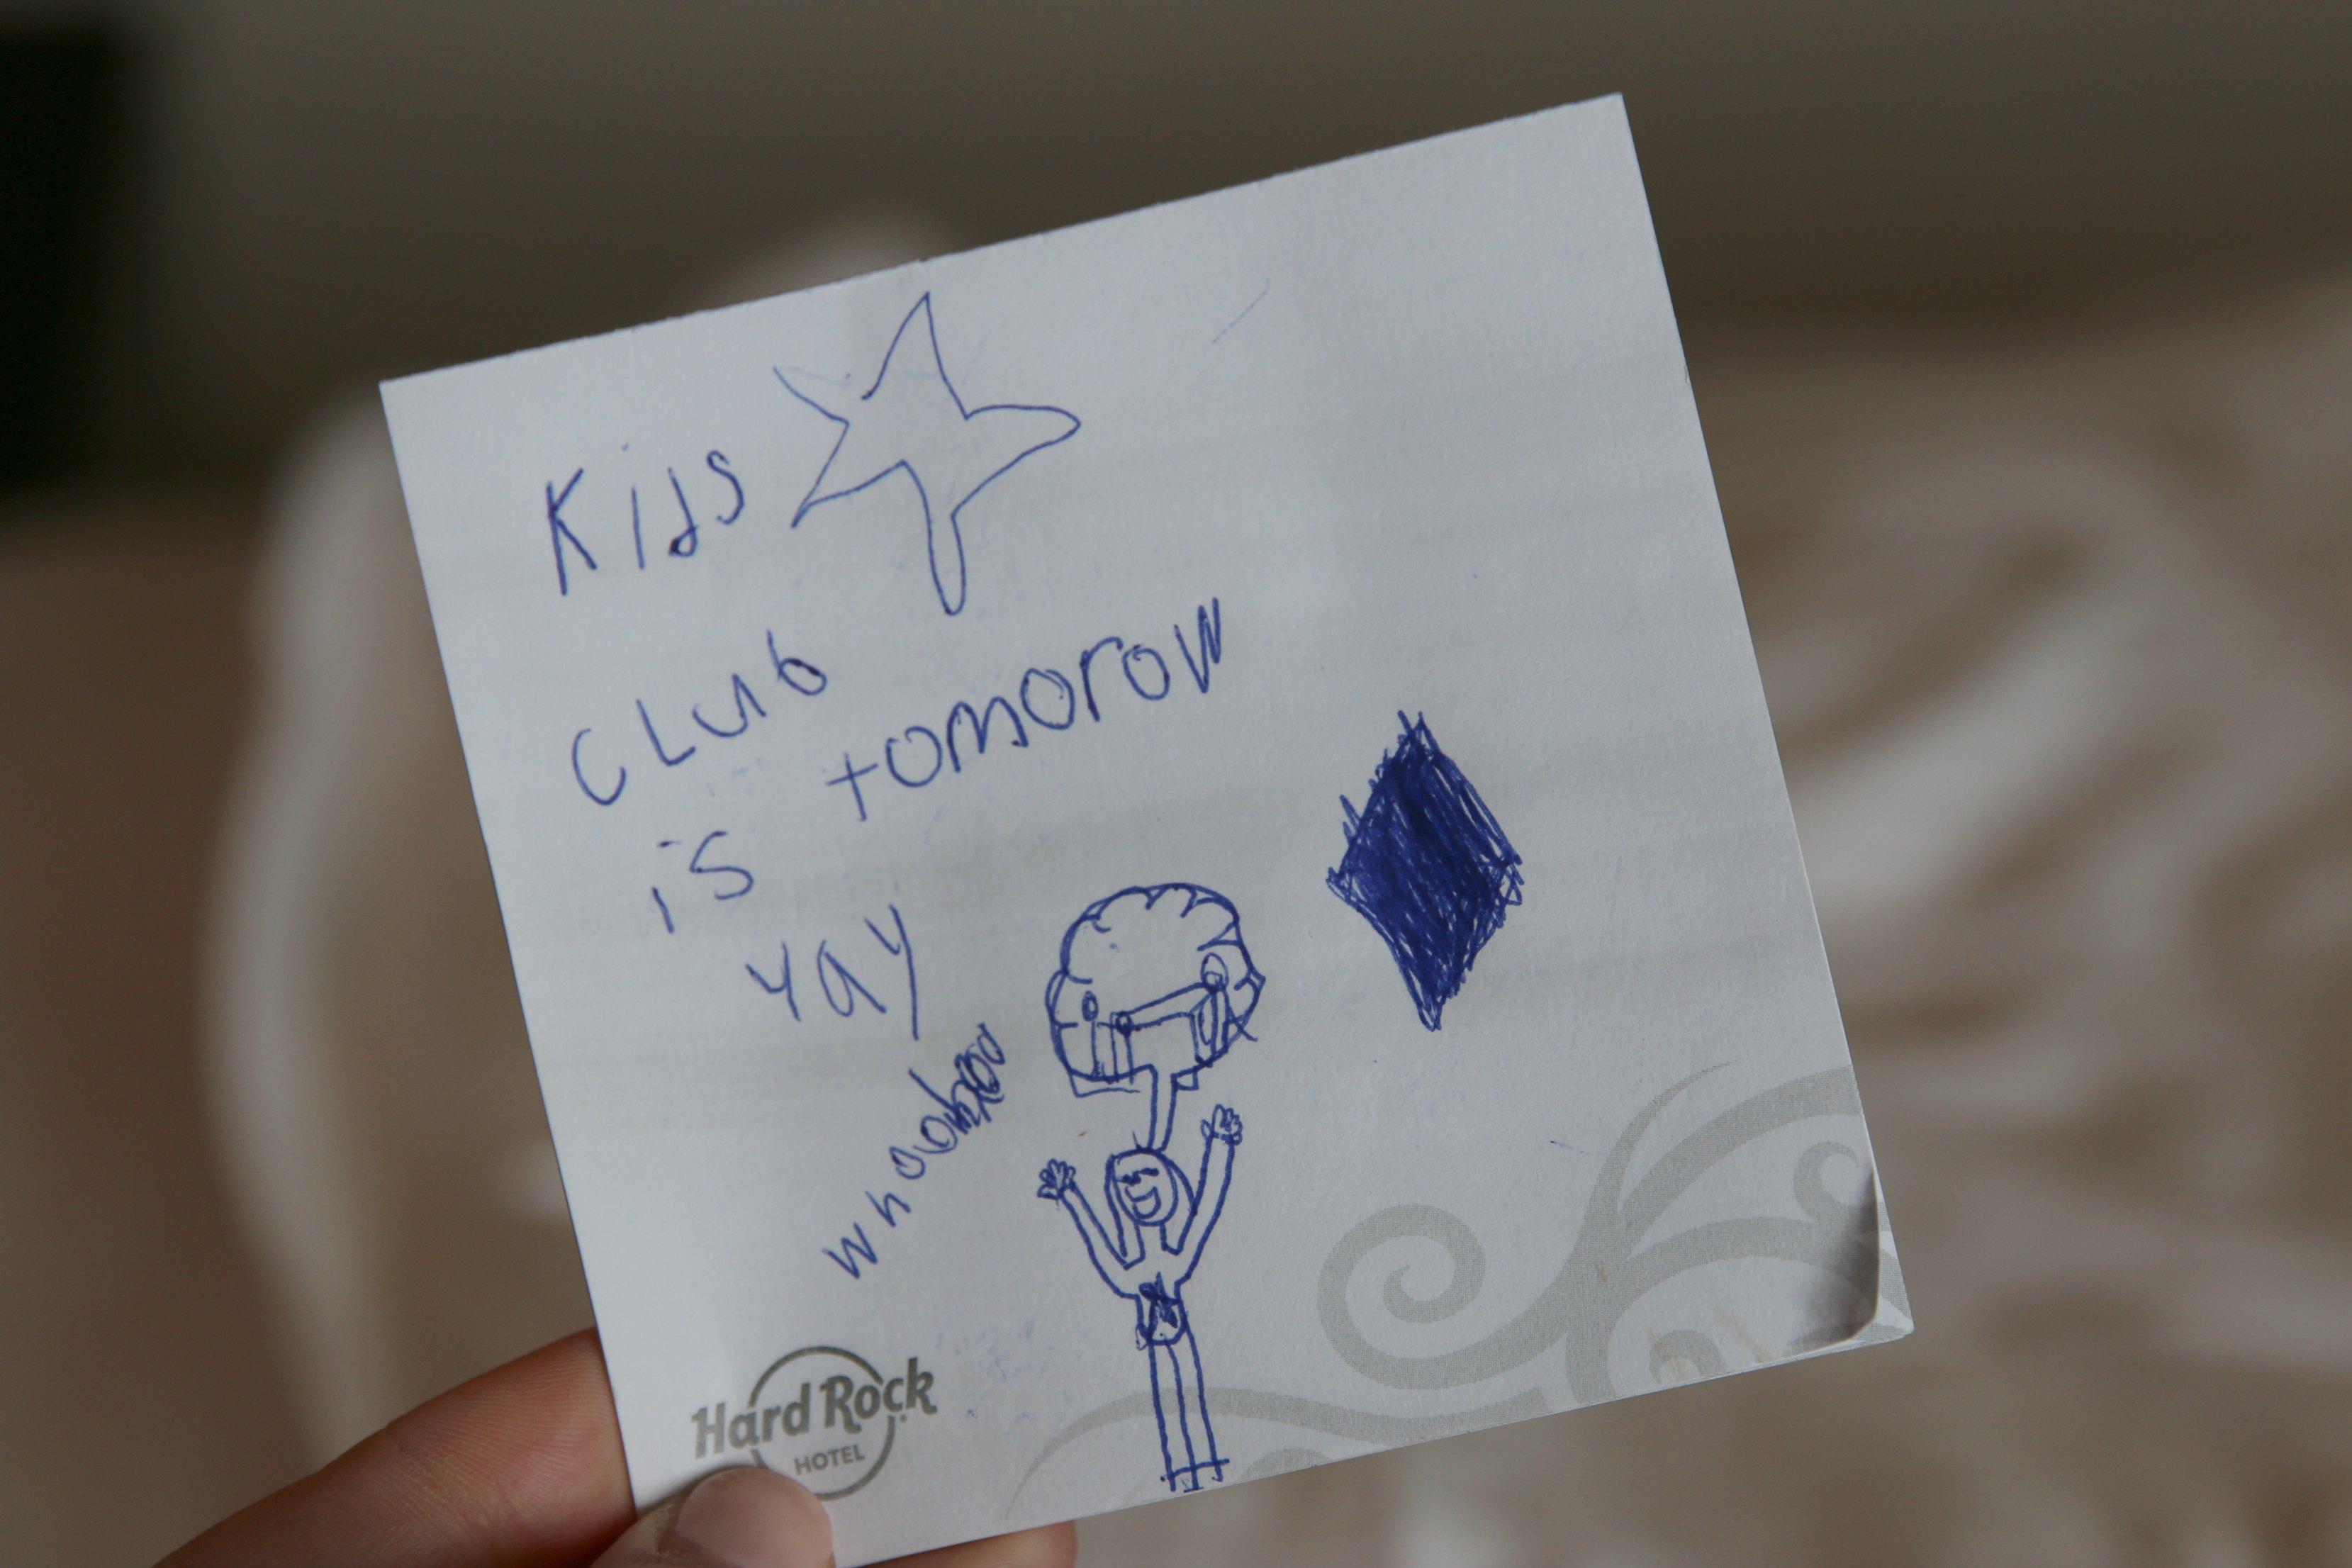 kids-club-review-hard-rock-cancun-mexico